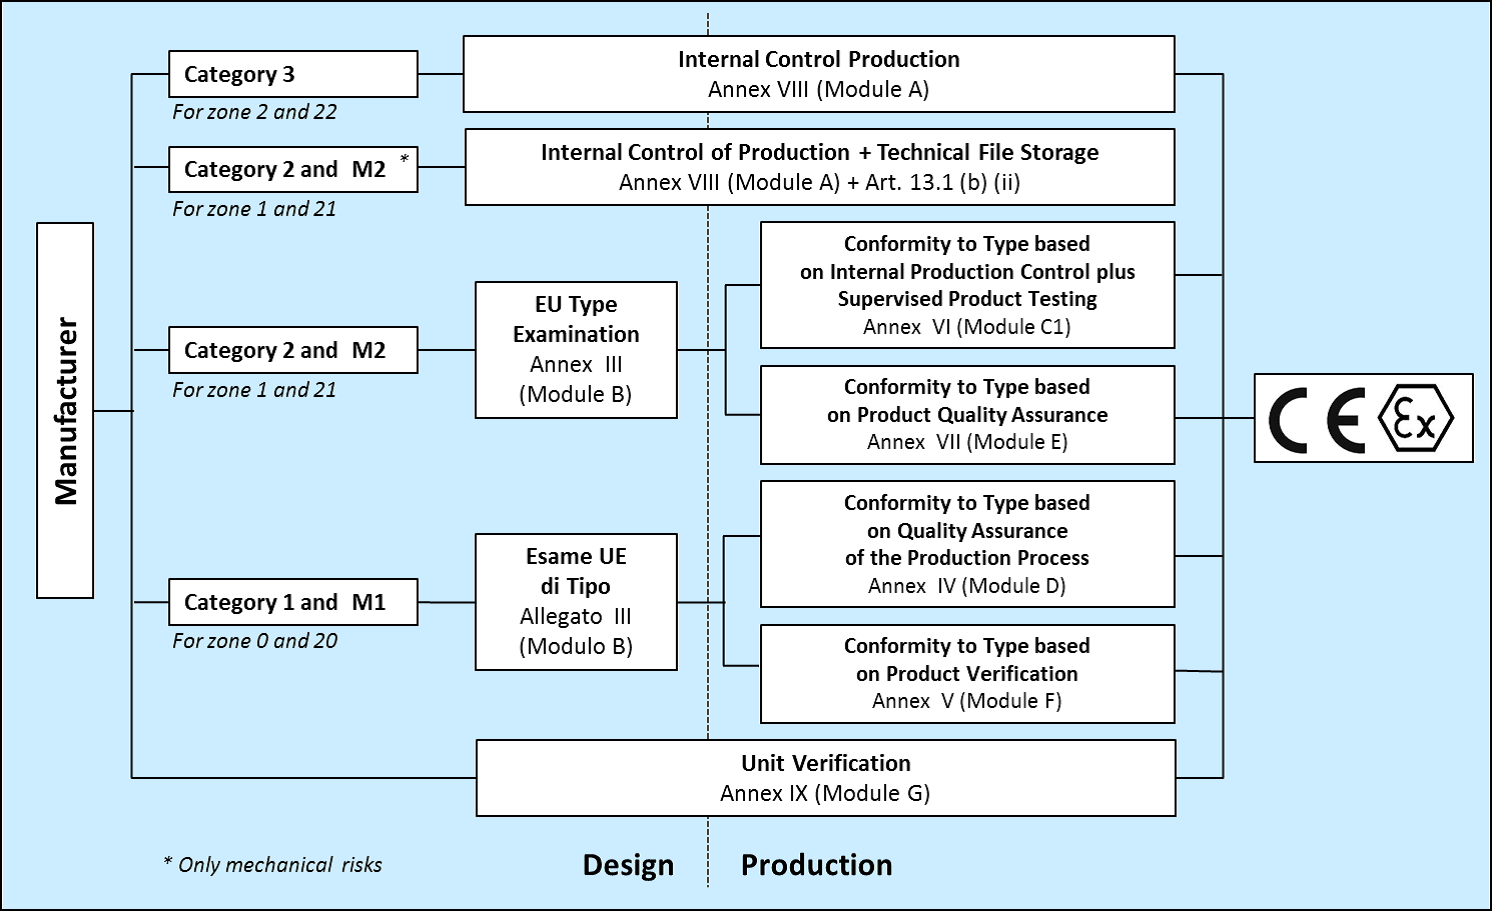 atex certification directive testing explosive eurofins explained environment scientific